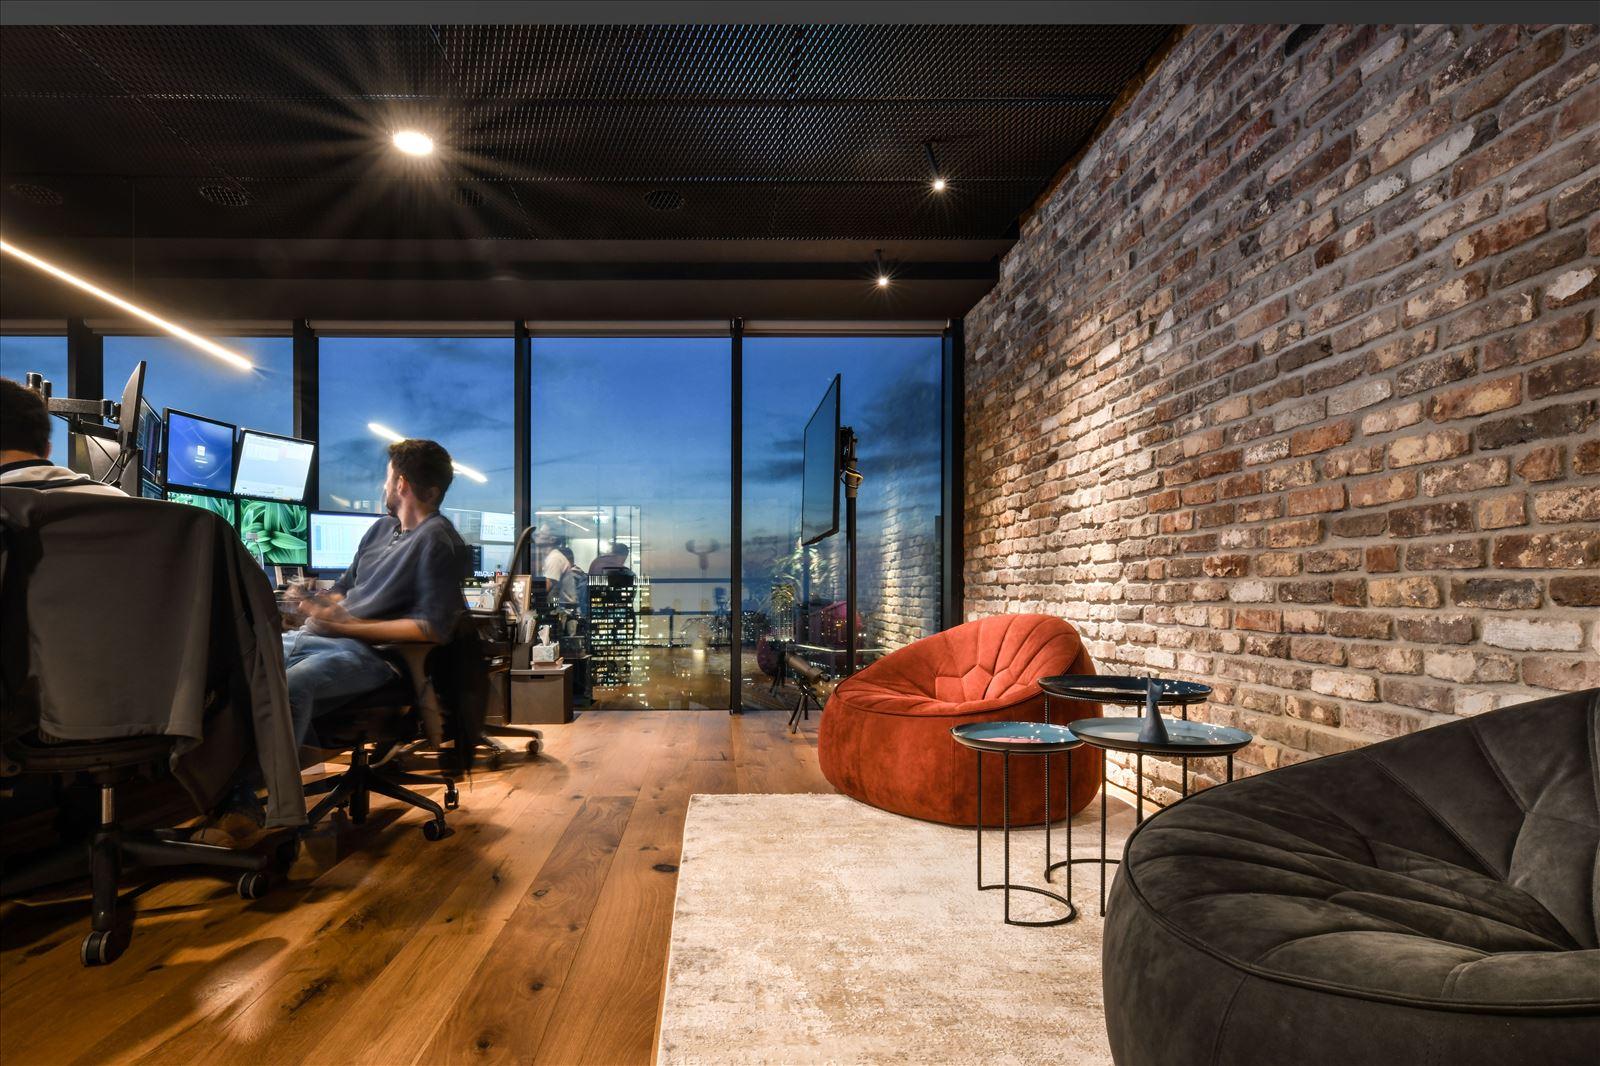 Arbitrage office תקרת המשרד בשלל גופי תאורה בעיצובו של דורי קמחי